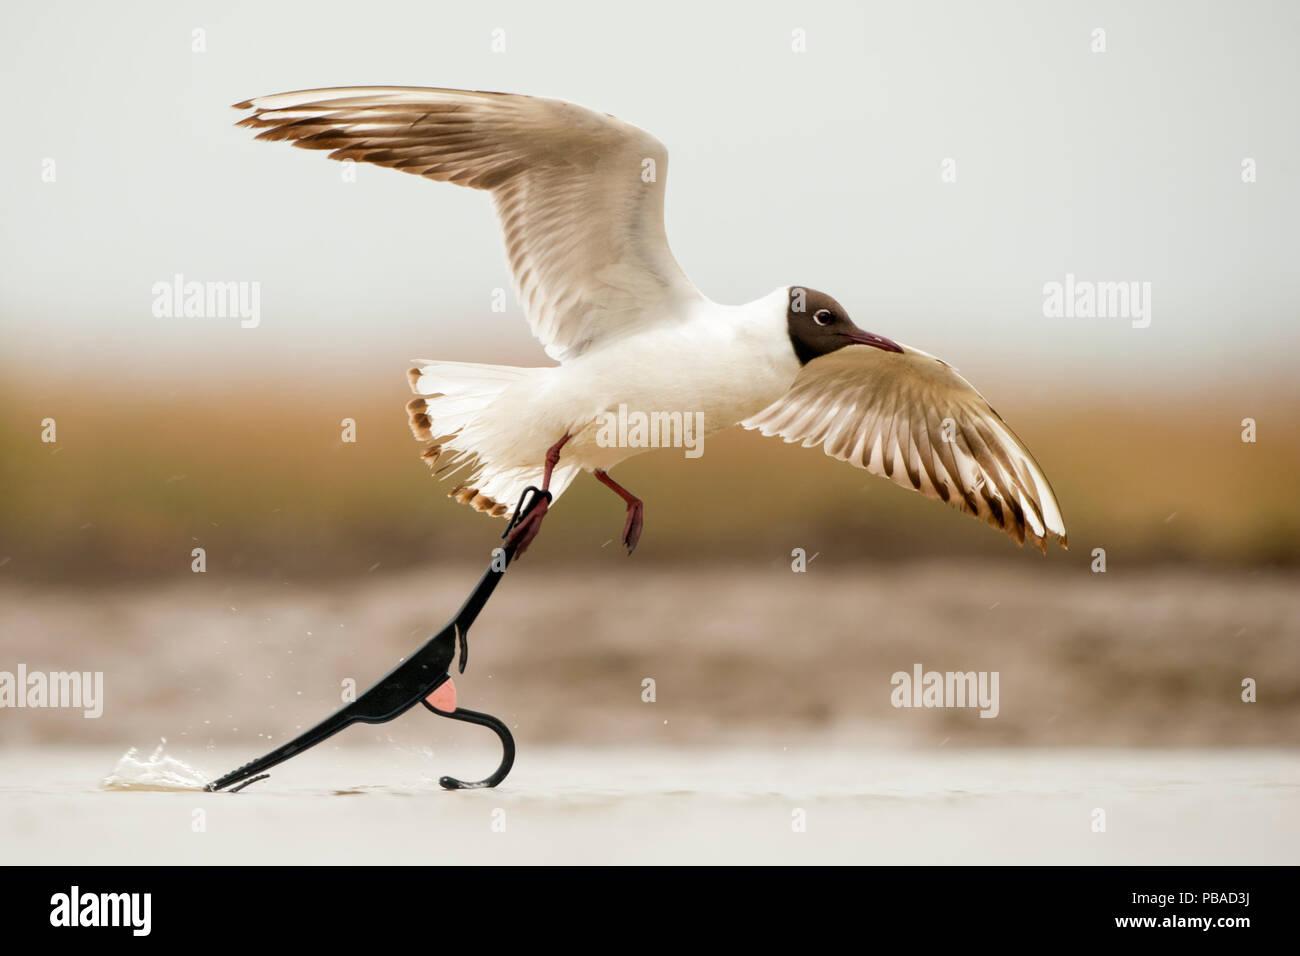 Black headed gull (Chroicocephalus ridibundus) taking off with foot caught in discarded coat hanger, Lake Csaj, Kiskunsagi National Park, Pusztaszer, Hungary. May. Stock Photo